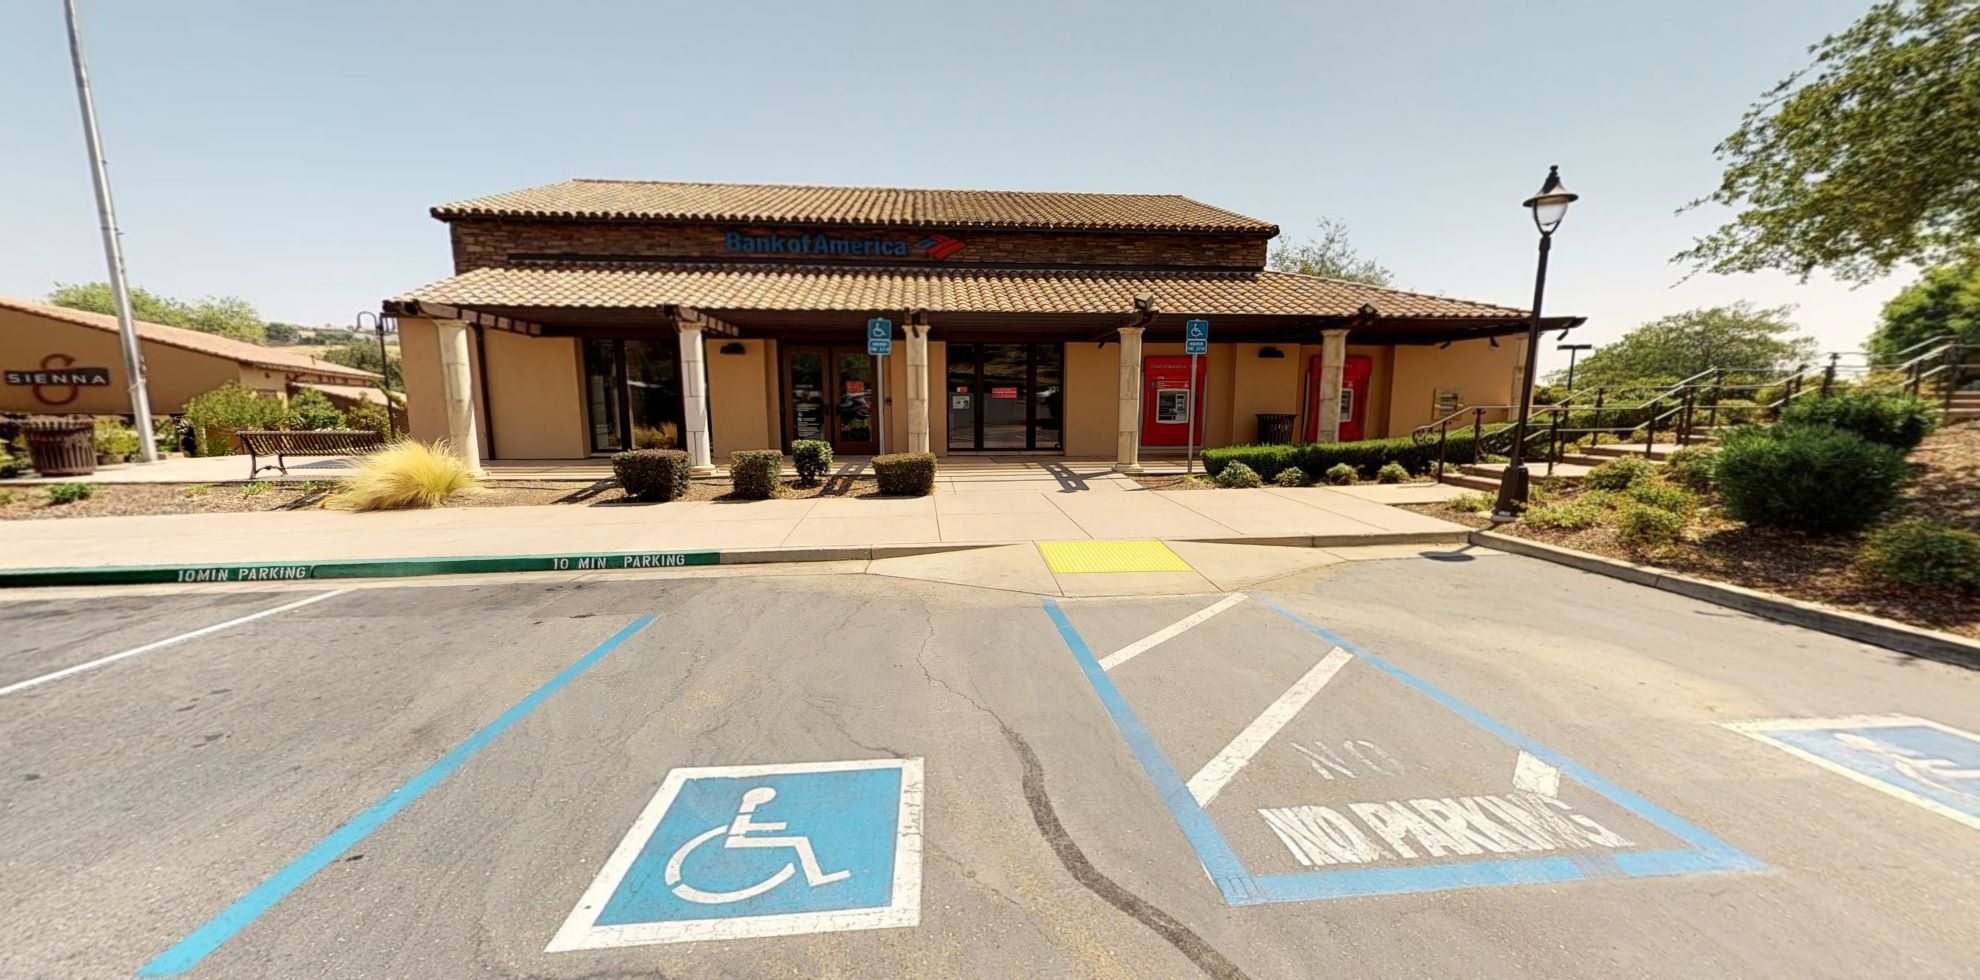 Bank of America financial center with walk-up ATM   3901 Park Dr, El Dorado Hills, CA 95762